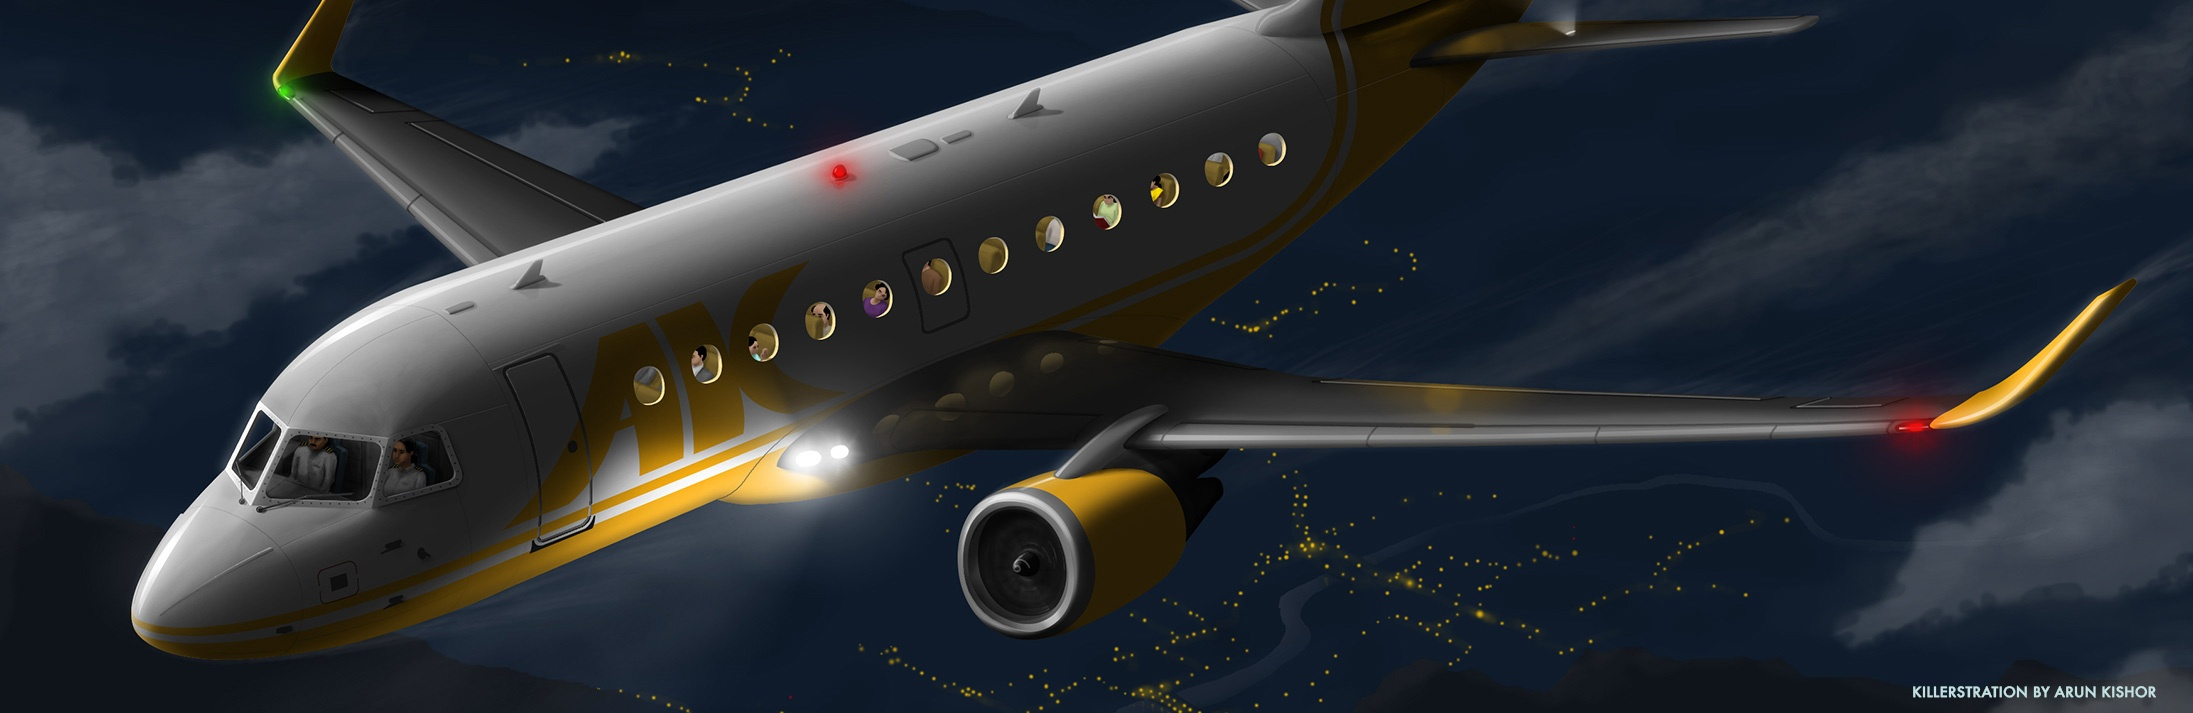 Aeroplane illustration by Arun Kishor